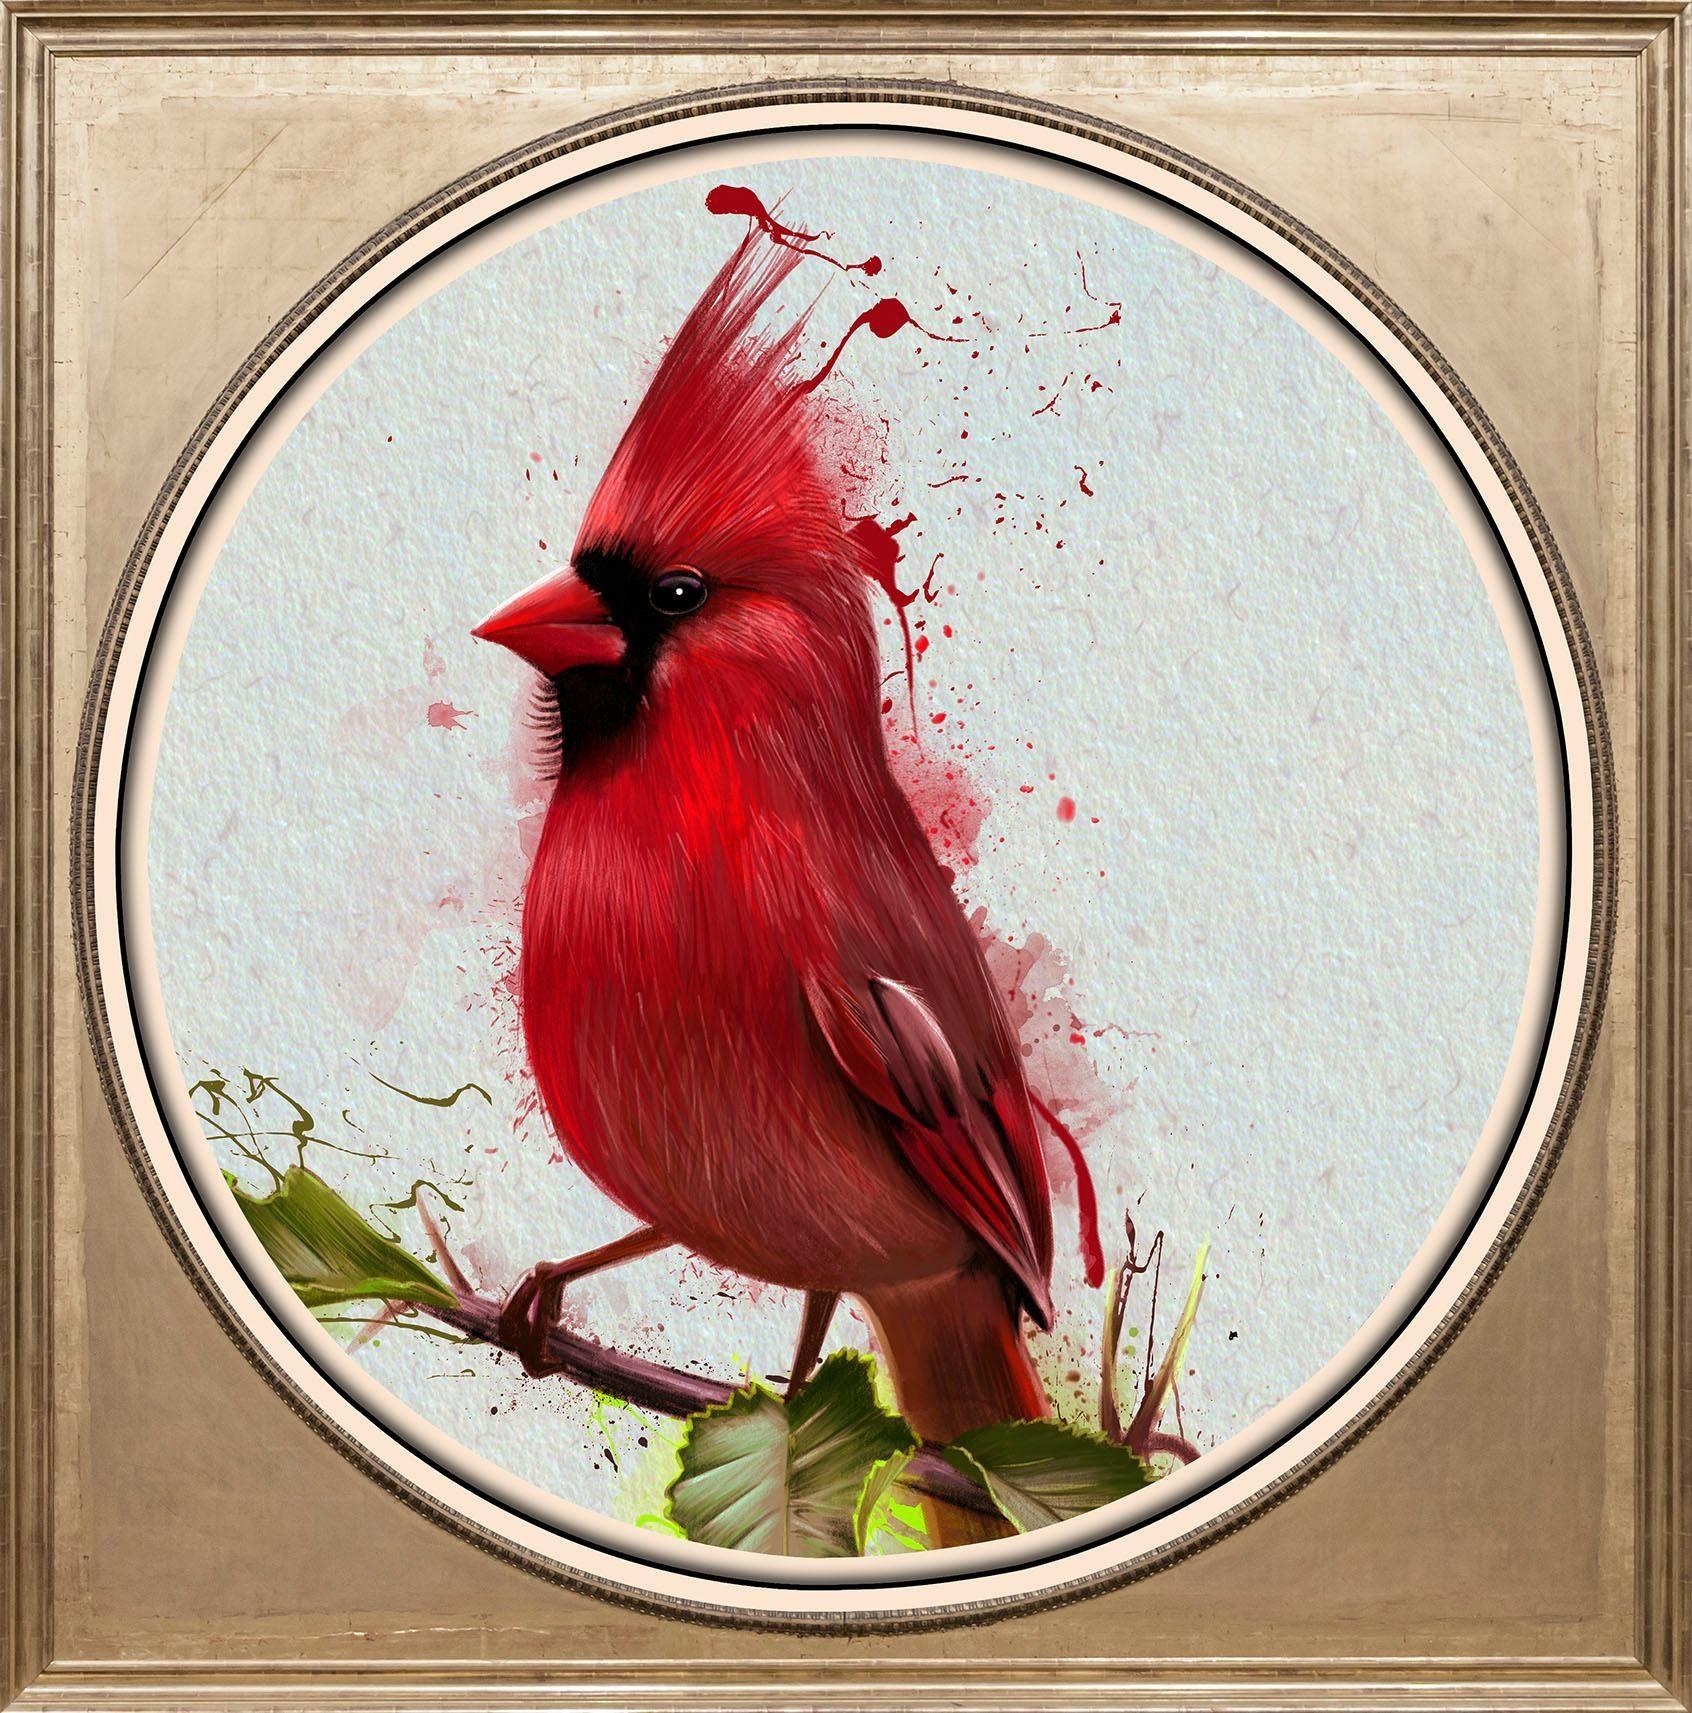 Acrylglasbild »Roter Vogel«